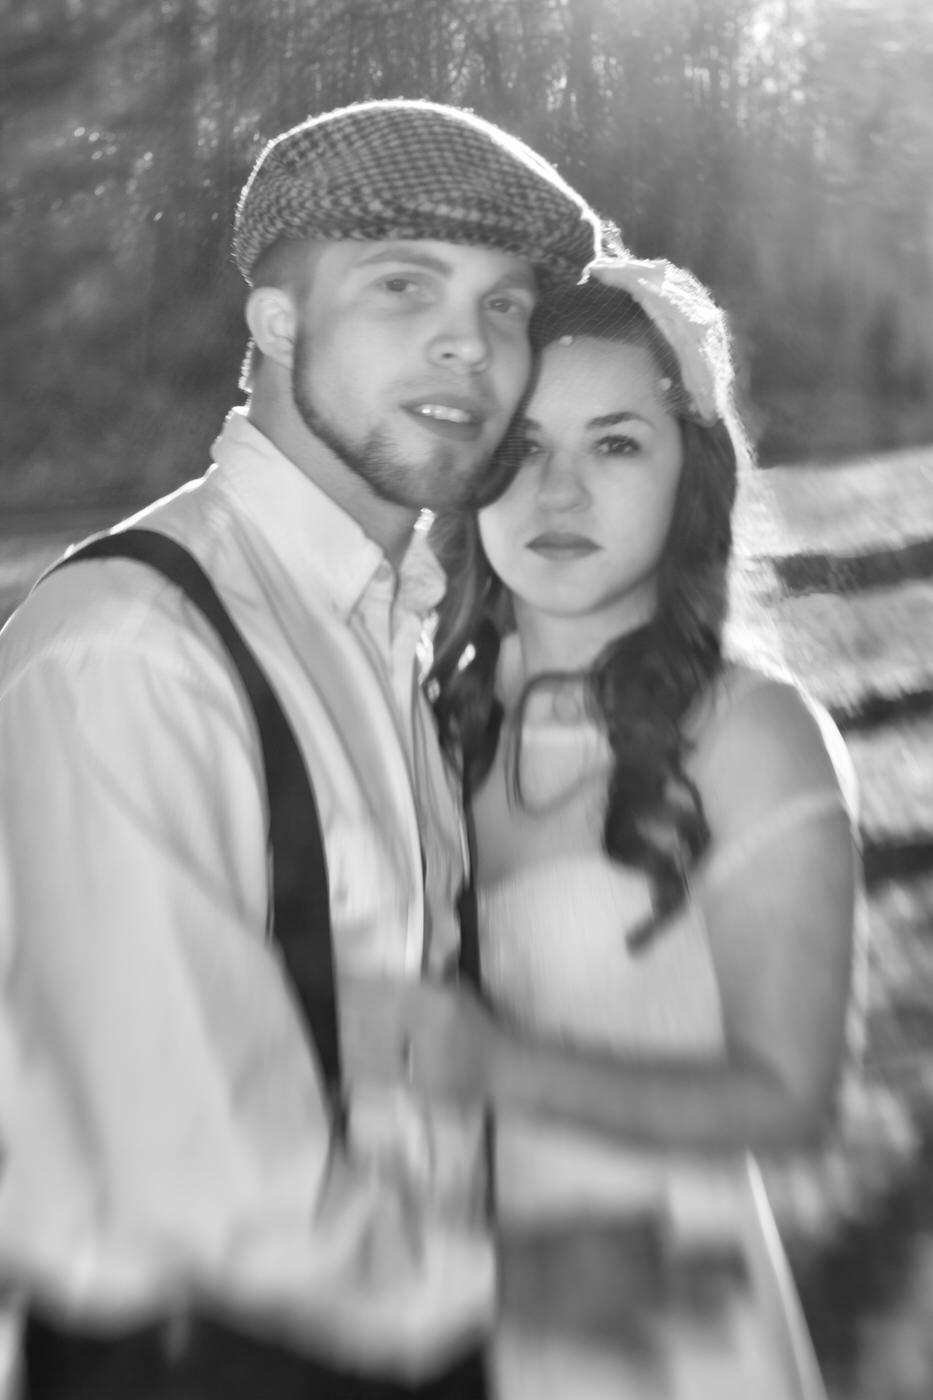 #rodneysmithphotography,2013,Blue Ridge Parkway,Joel Stoeltzing,Lorena Fletcher,March,Rodney Smith Photography,engagement,